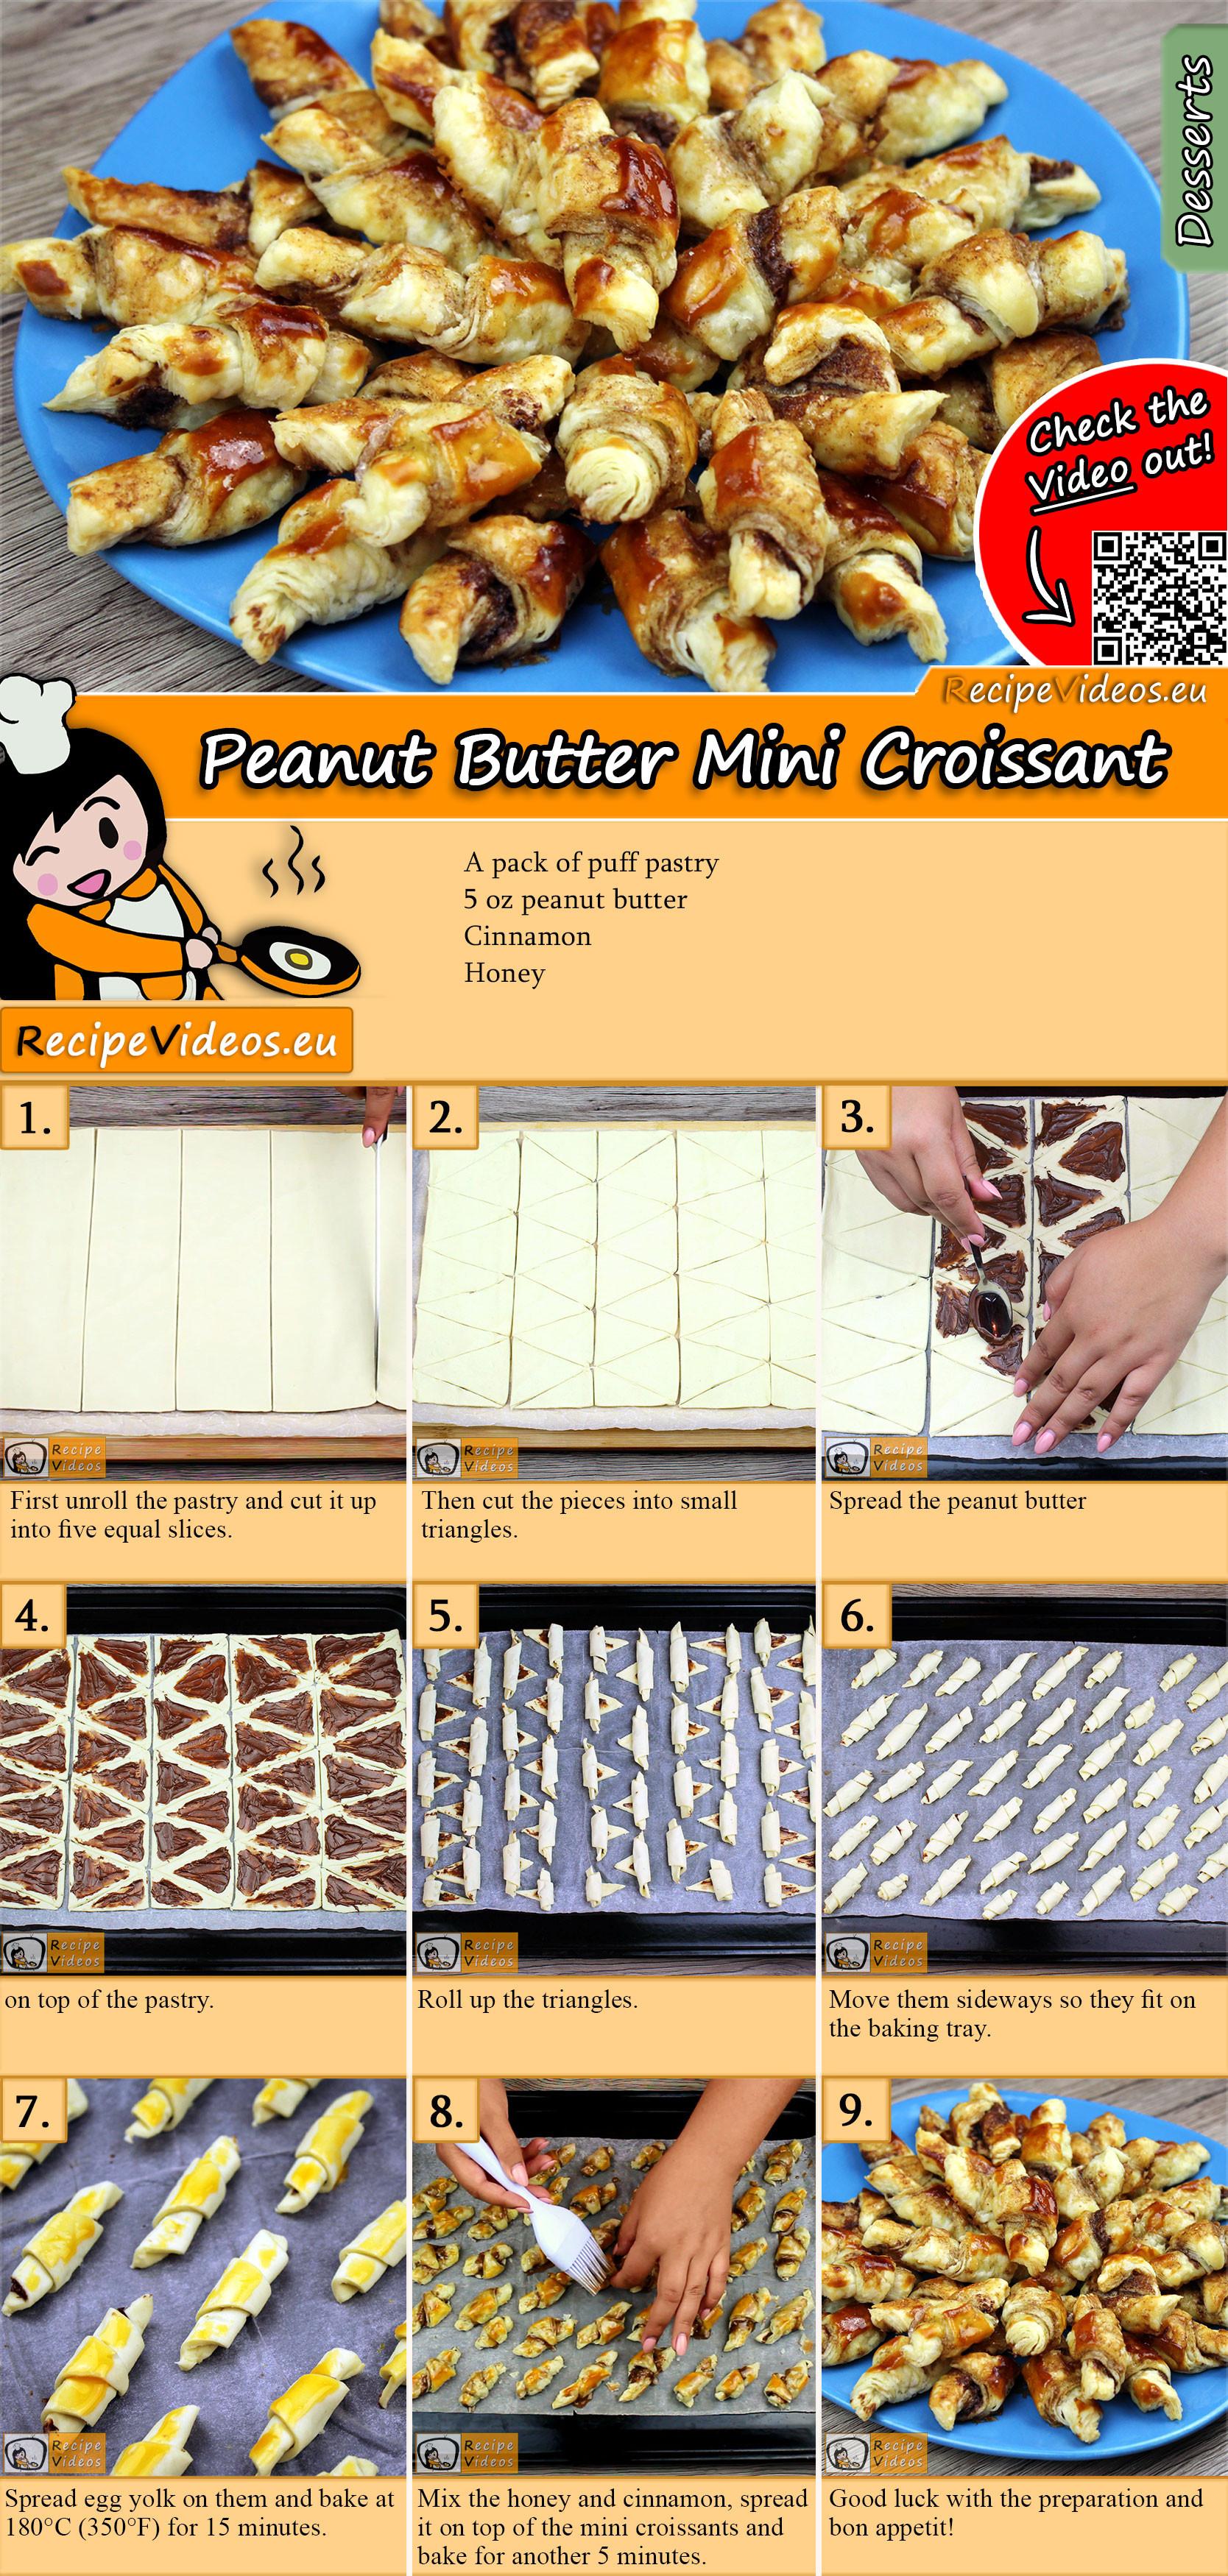 Peanut Butter Mini Croissant recipe with video